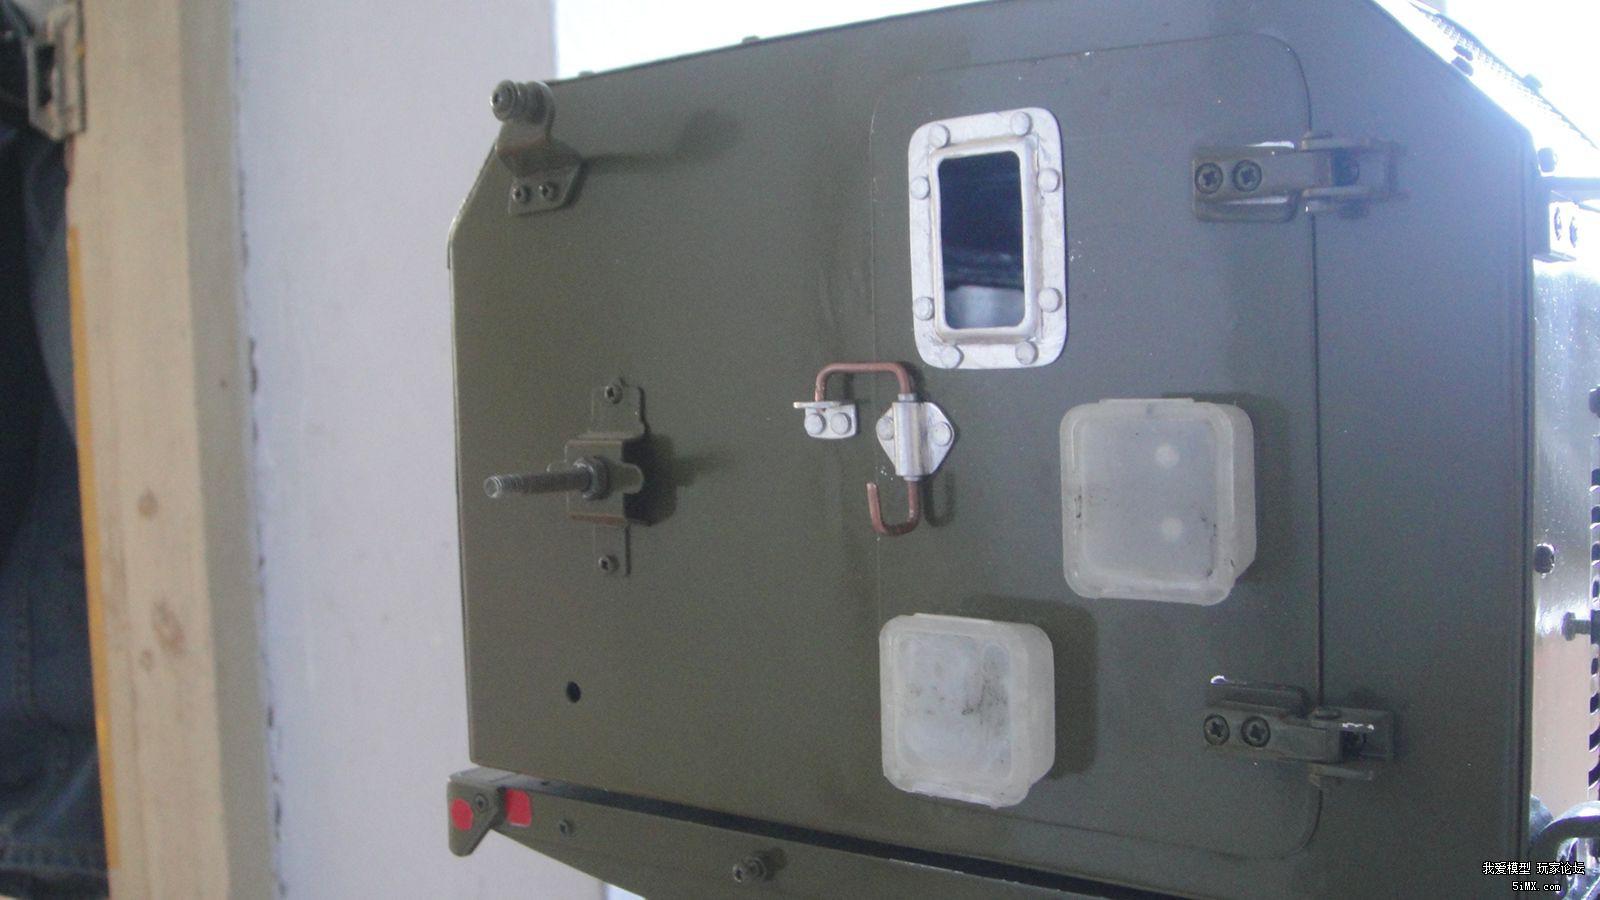 DSC09405.JPG